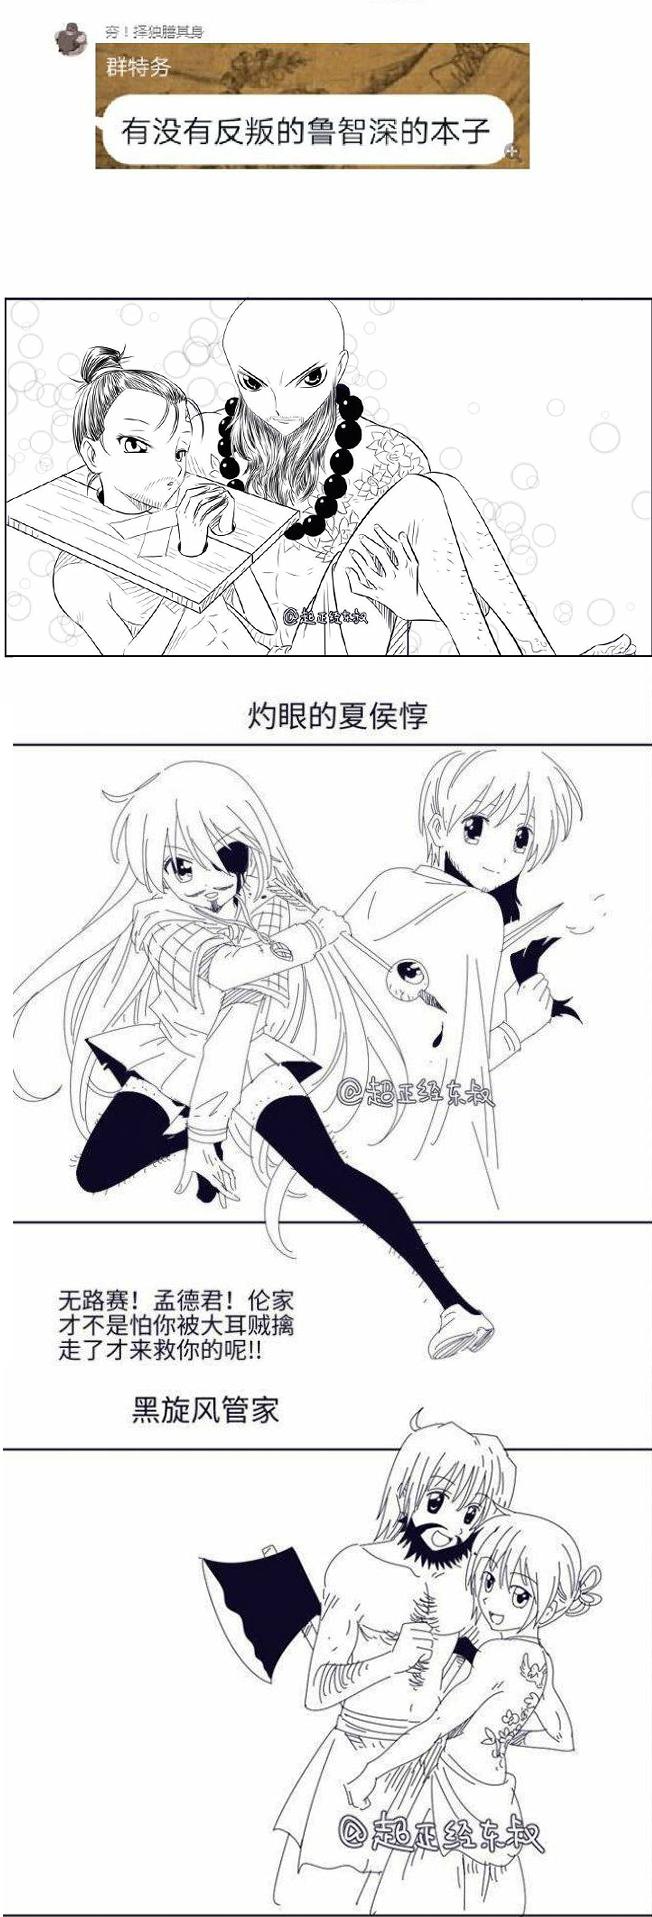 Re: [閒聊] 反叛的魯...等等這三小?